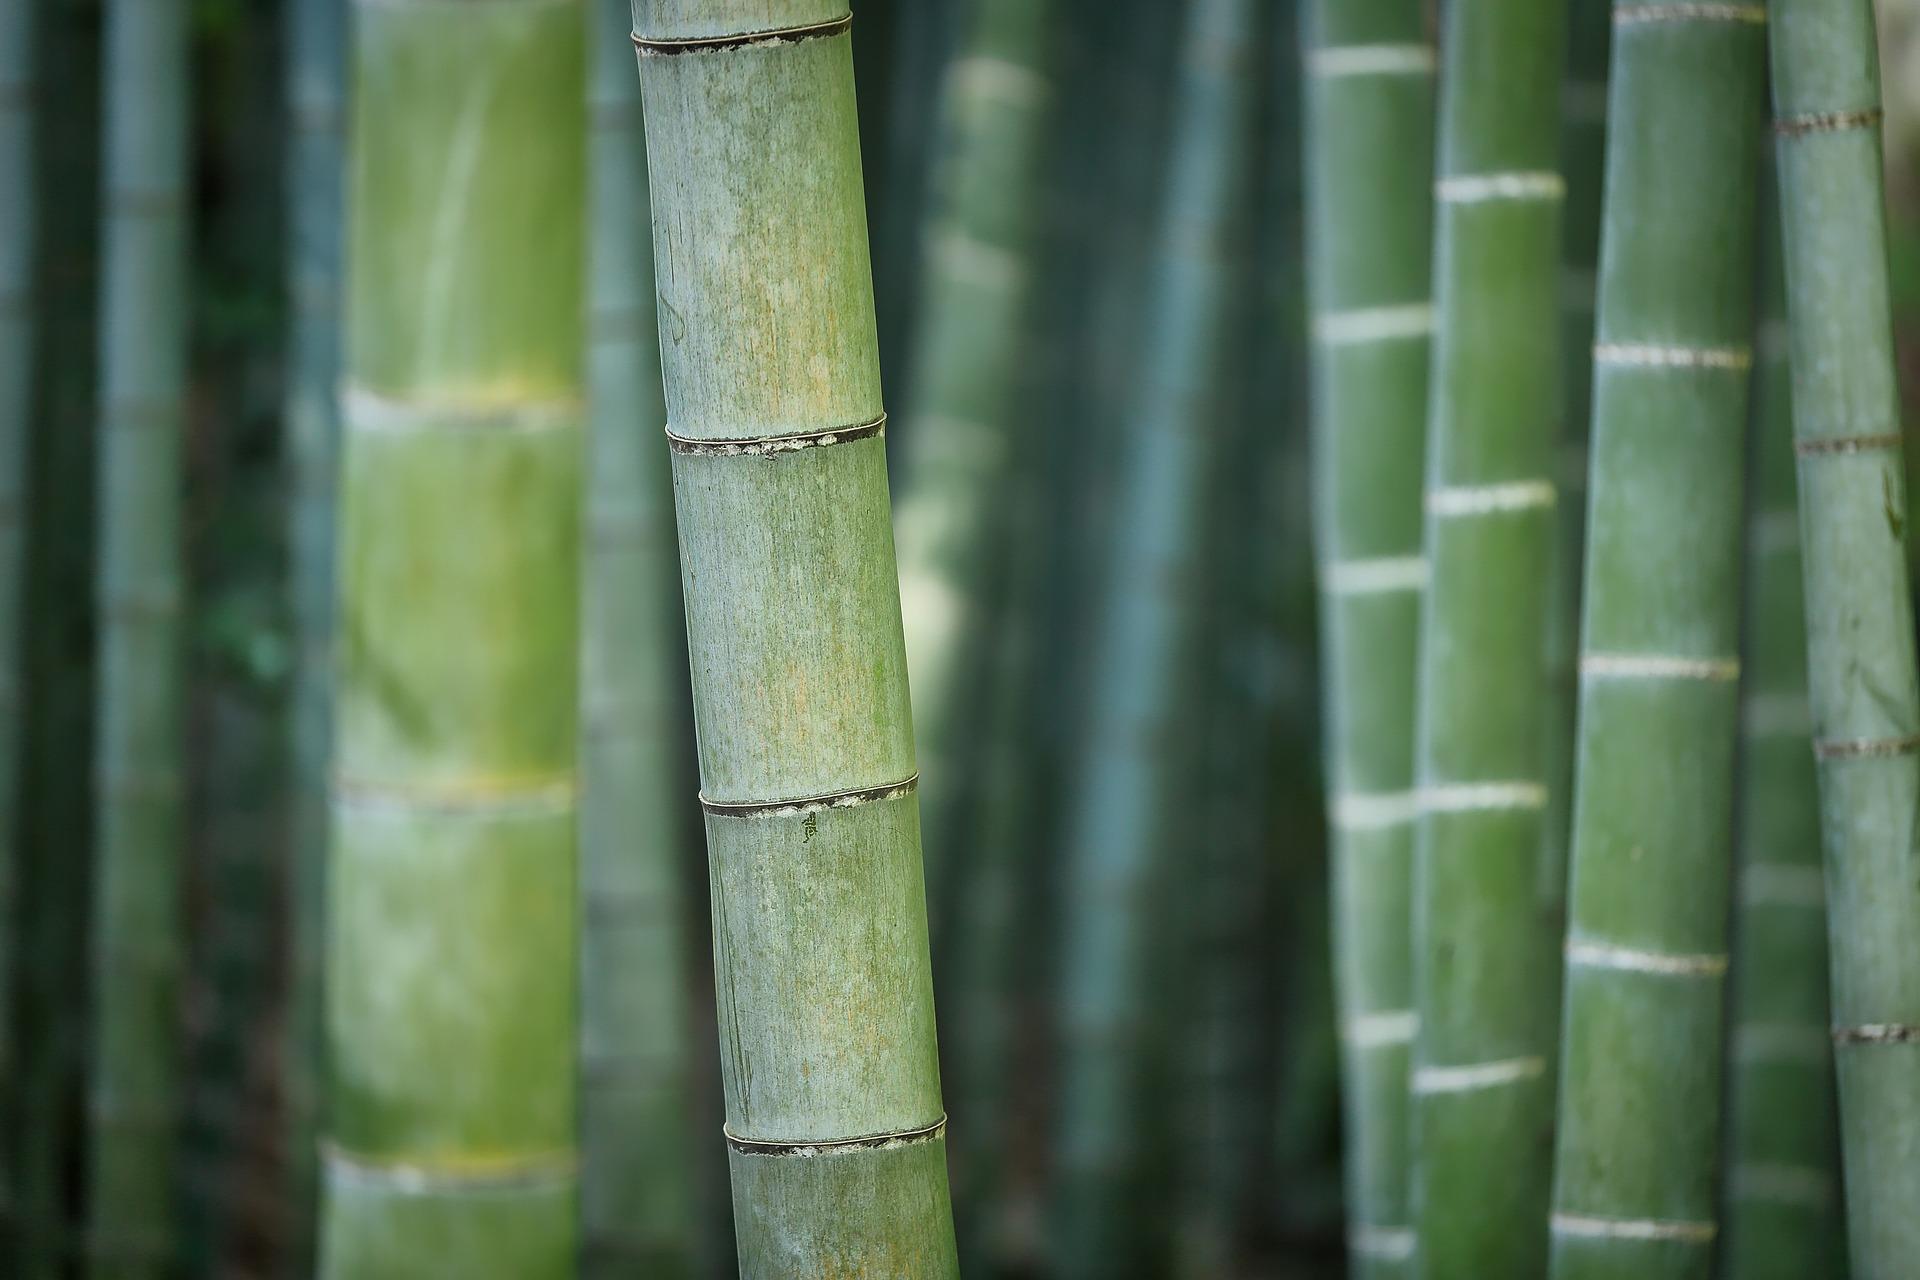 bamboo 3028709 1920